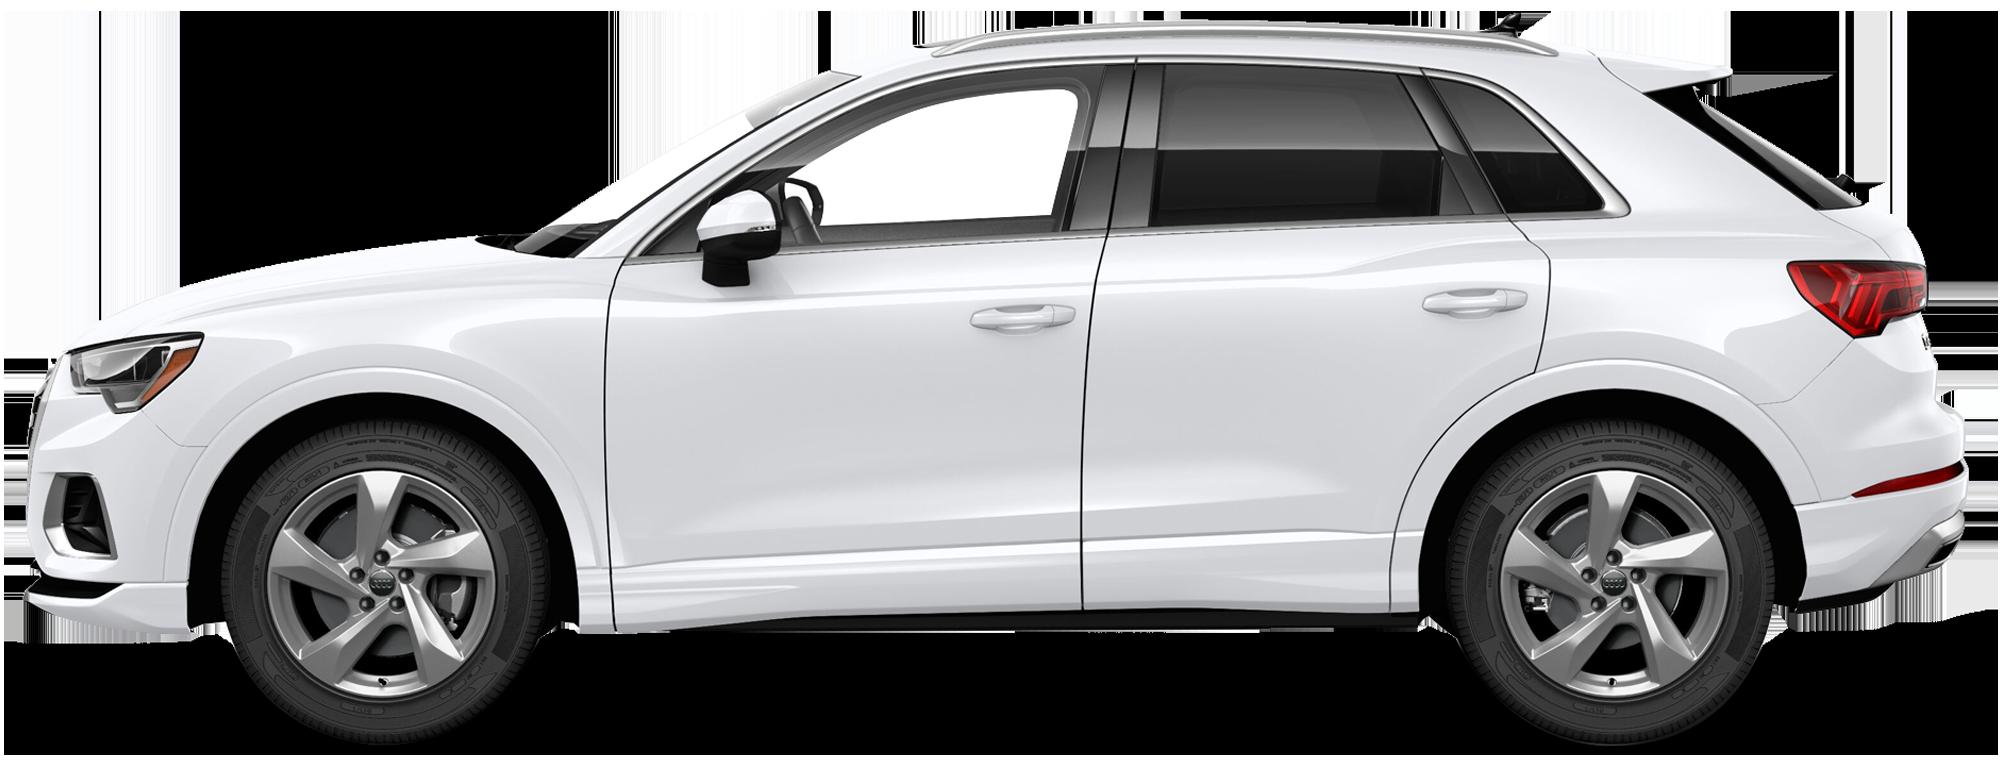 Audi Dealership Near Me >> Audi Indianapolis New Used Audi Dealer Near Me